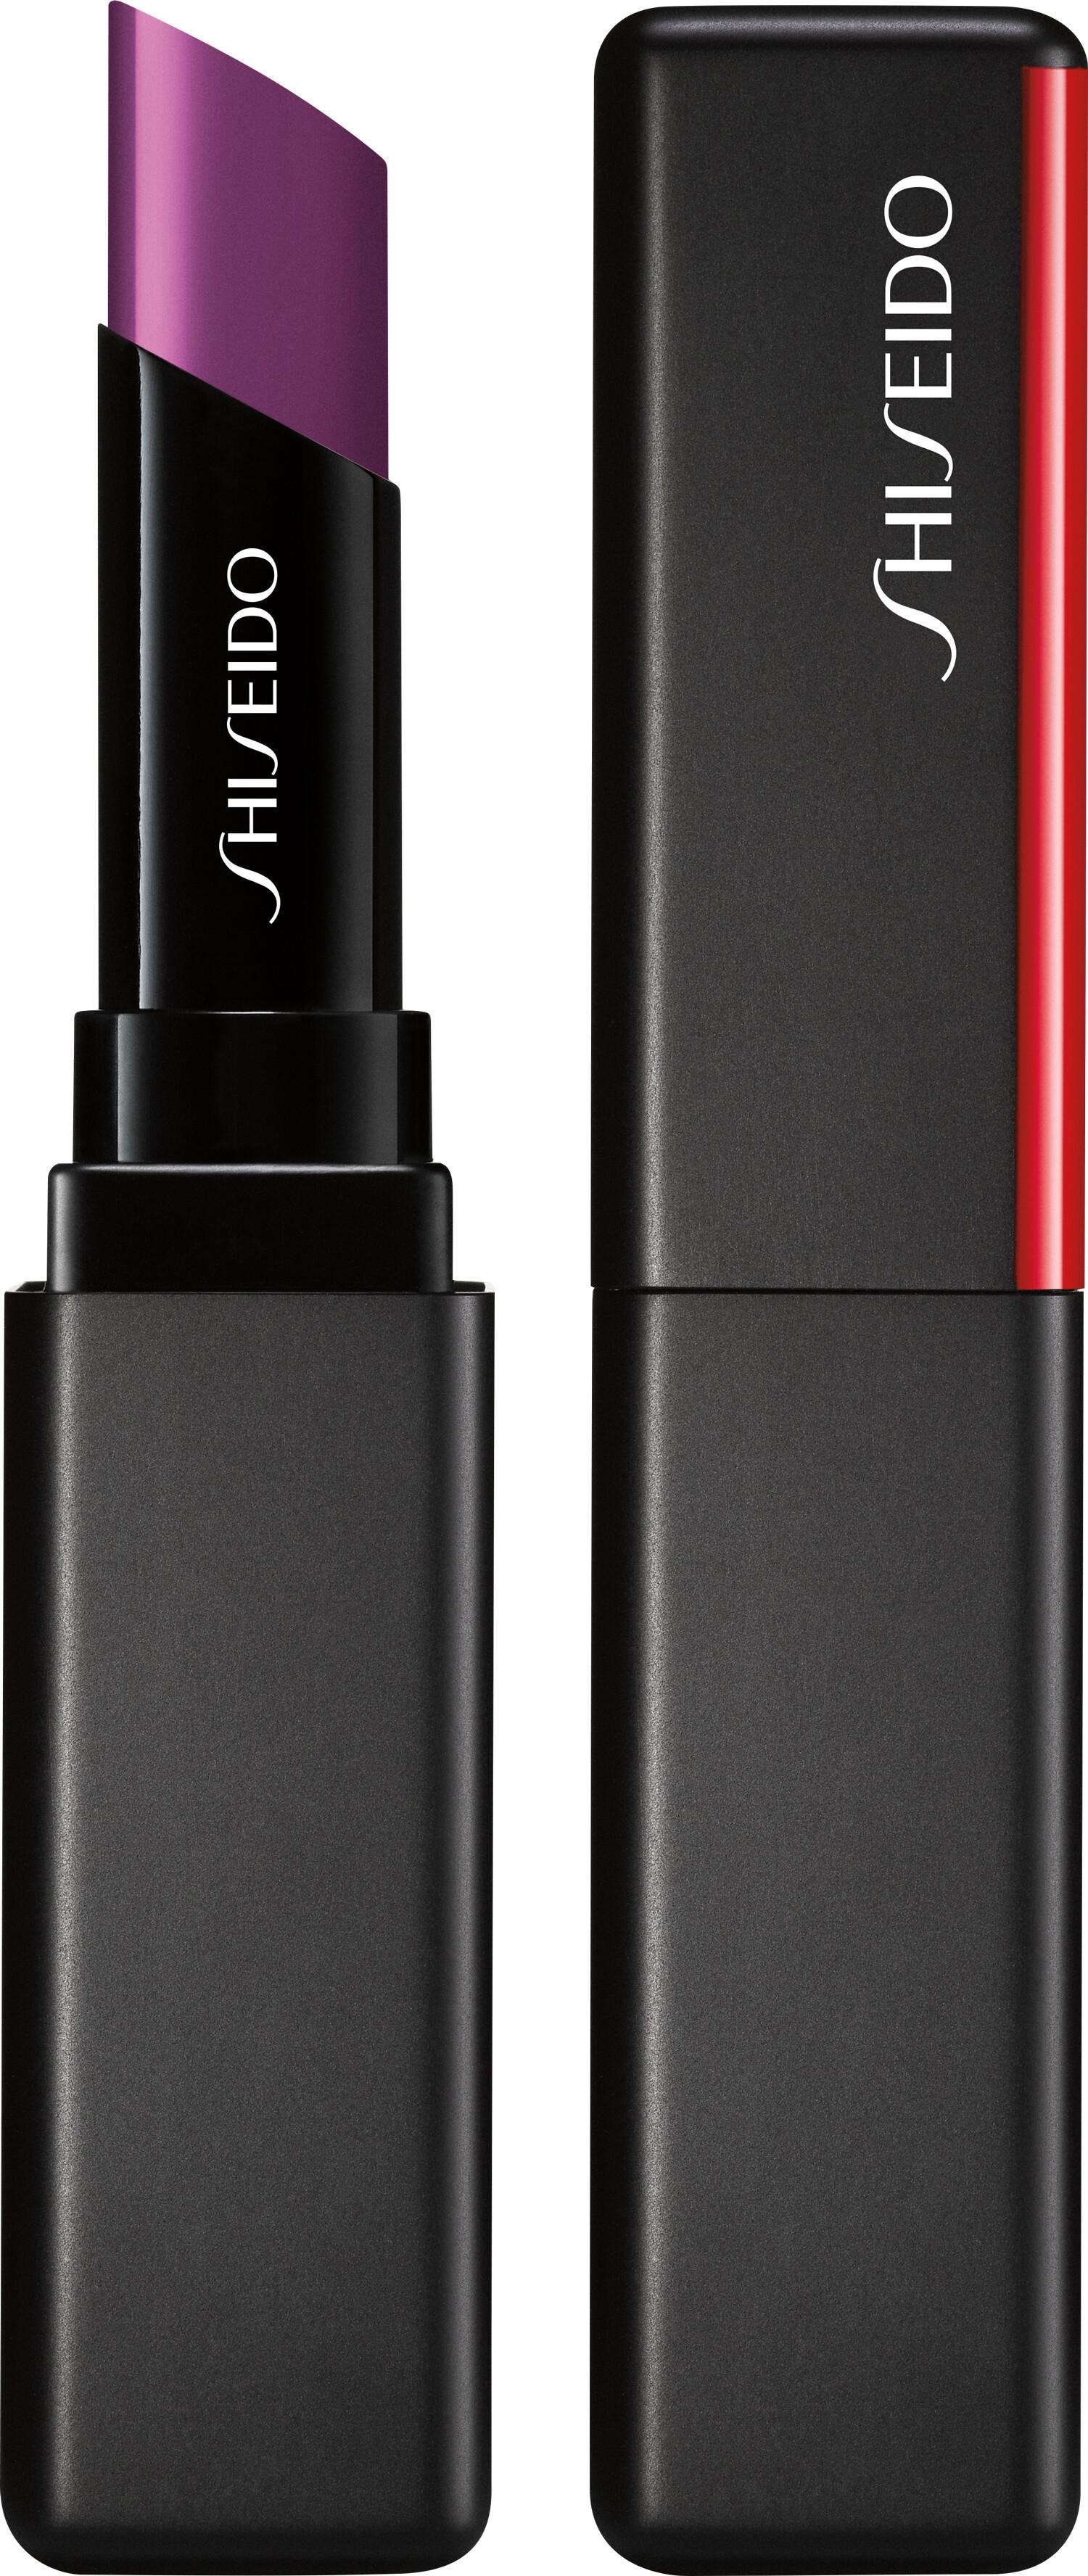 Shiseido VisionAiry Gel Lipstick 1.6g 215 - Future Shock